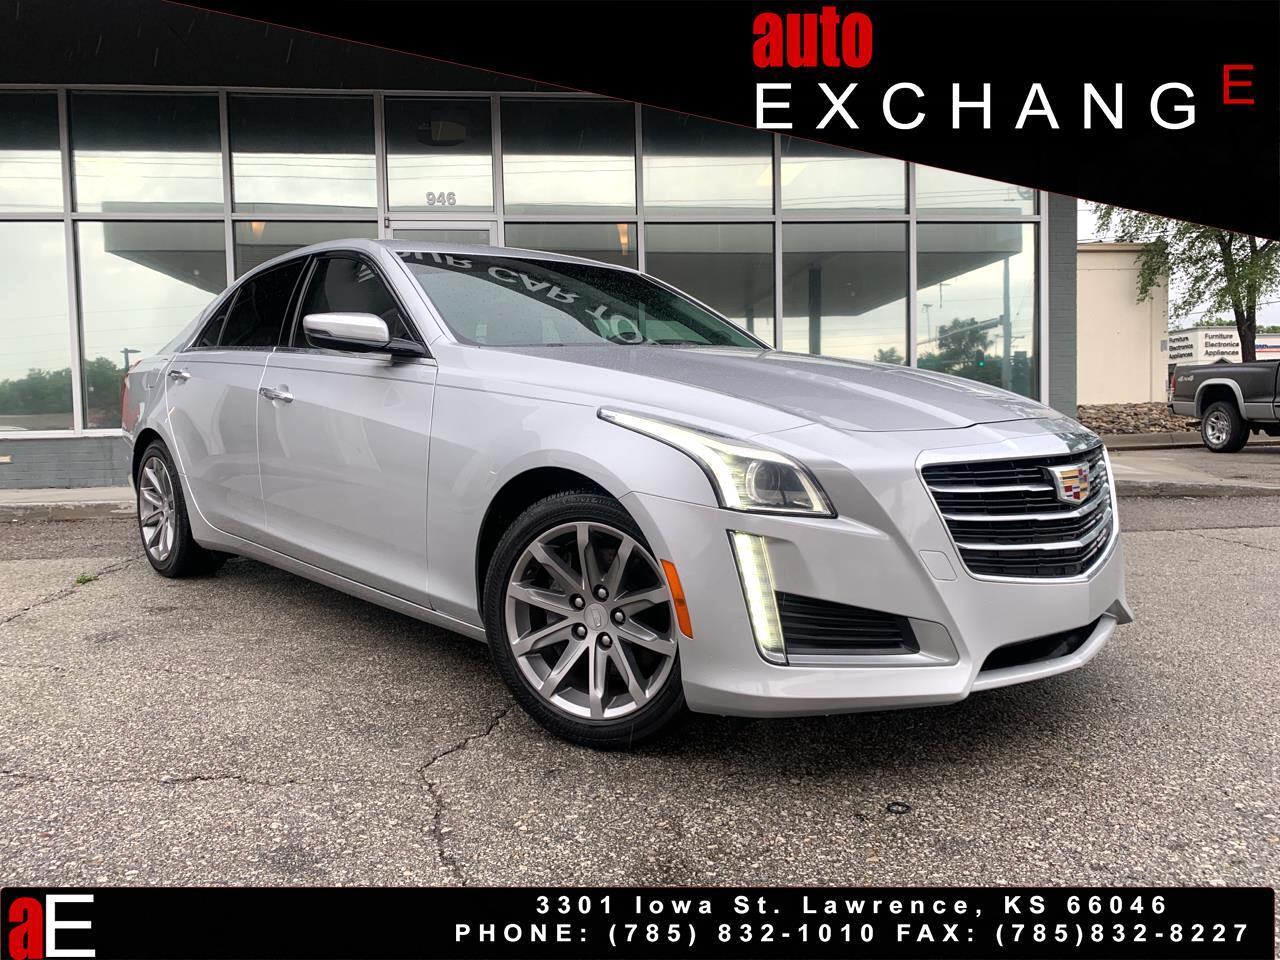 Cadillac CTS 3.6 Luxury 2016